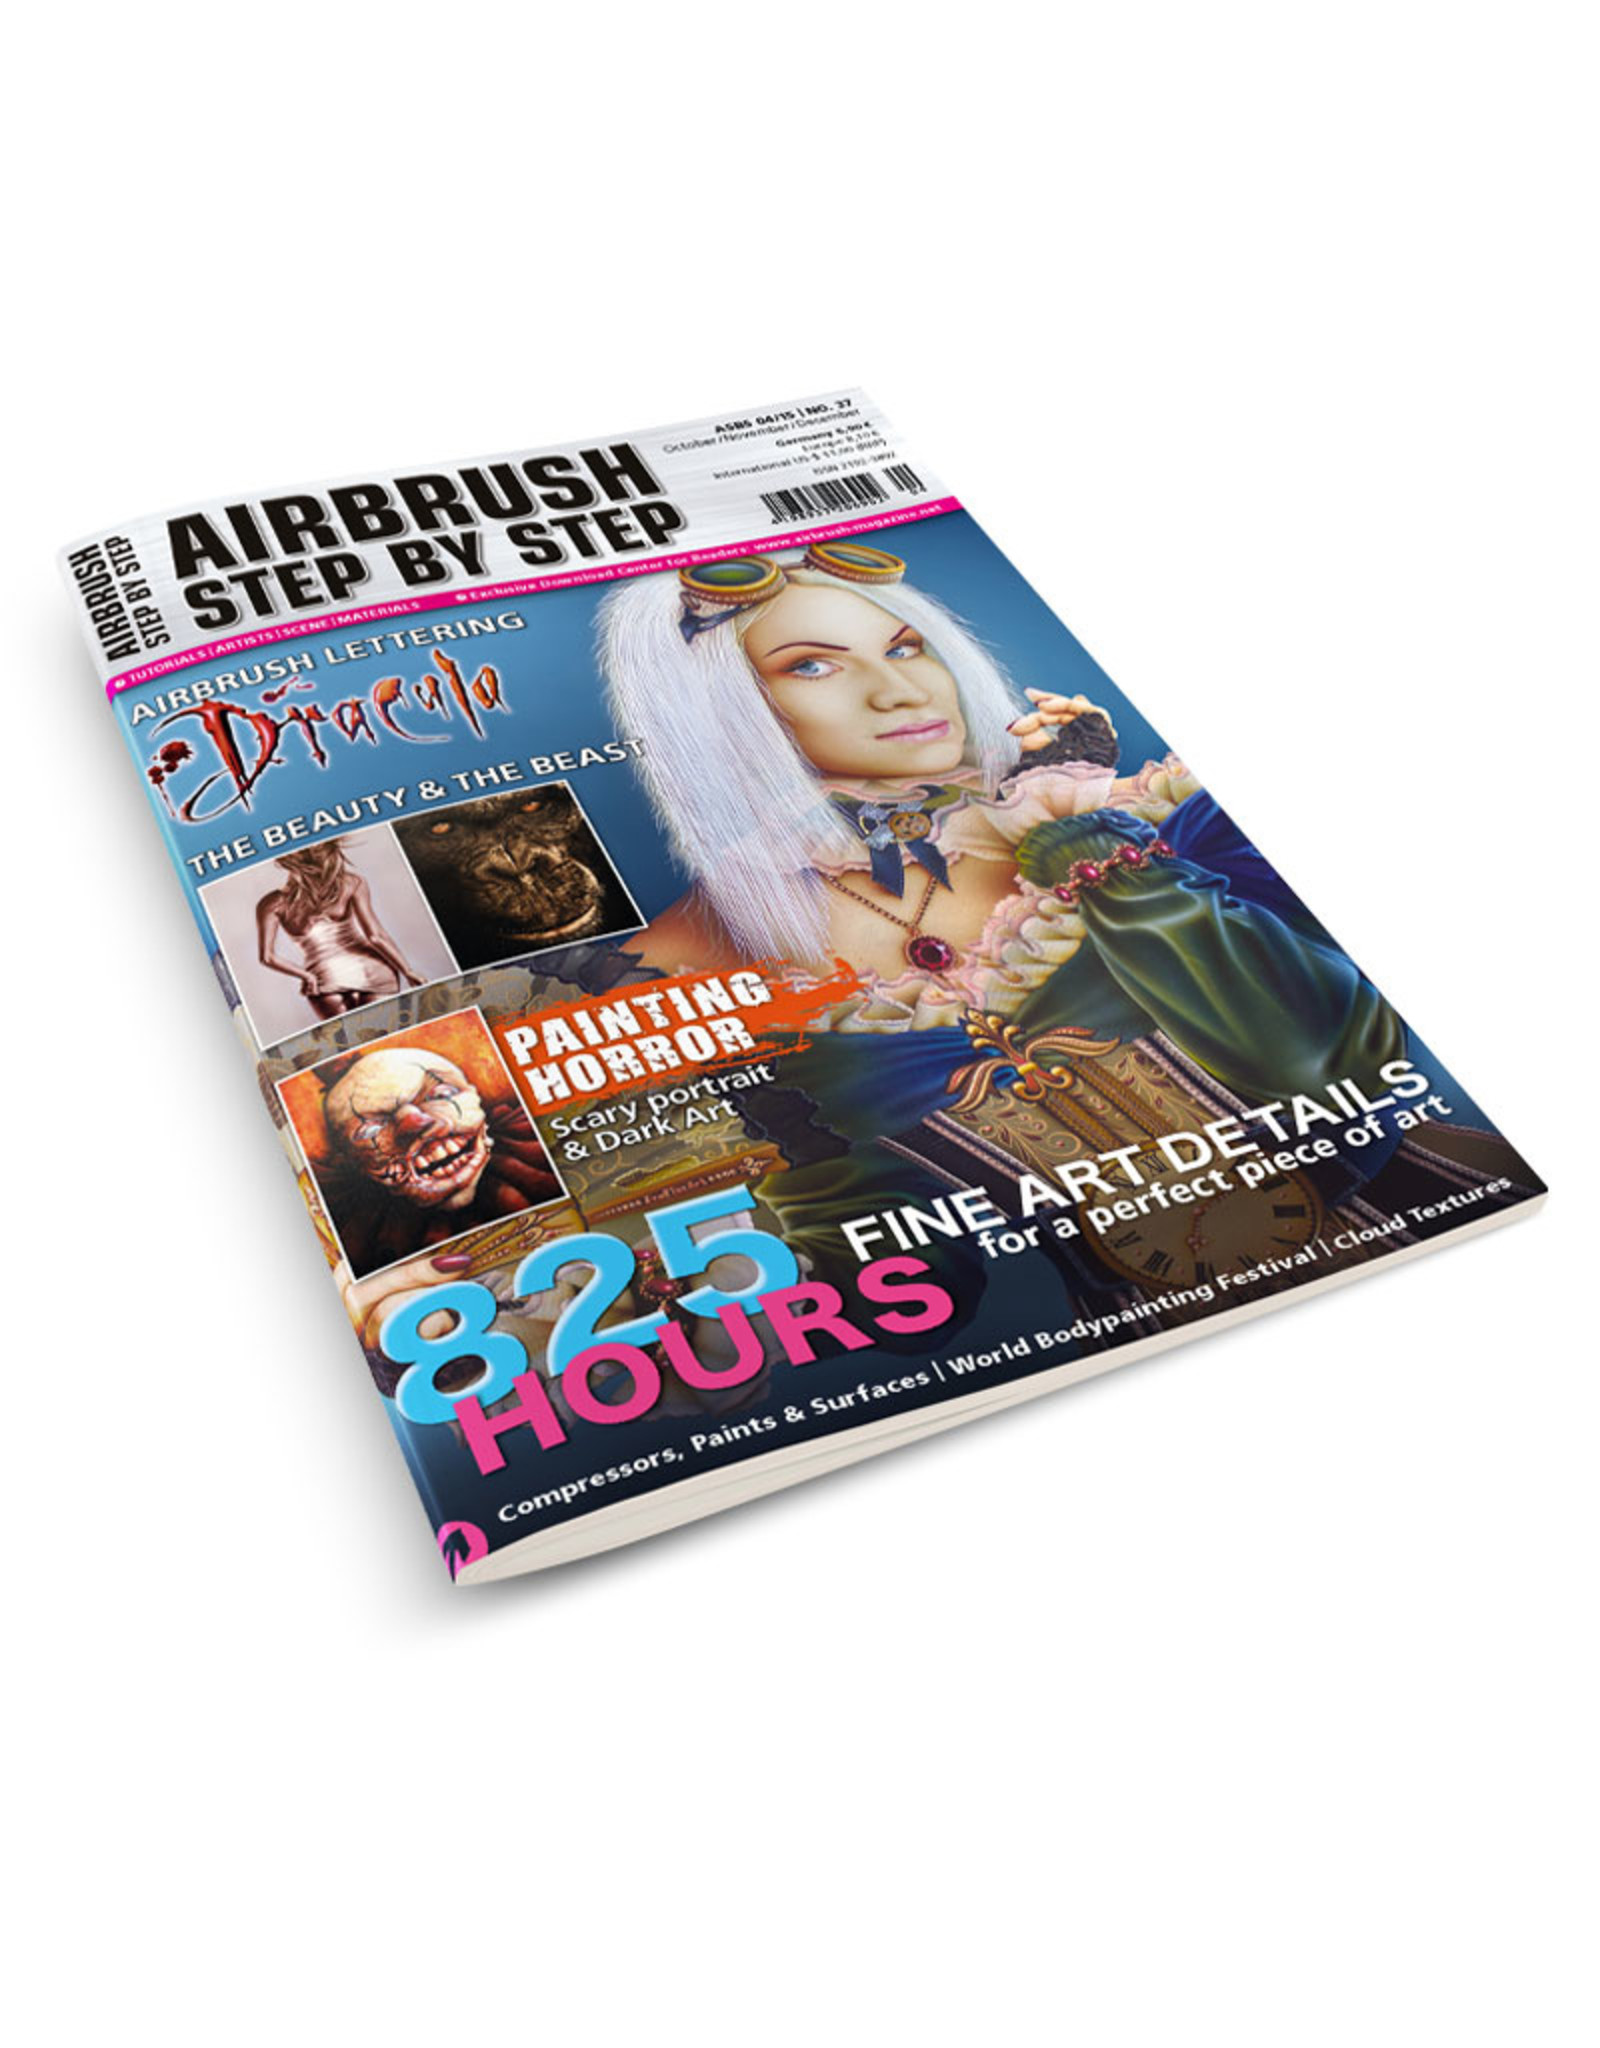 Airbrush Step by Step magazine Airbrush Step by Step Magazine 37